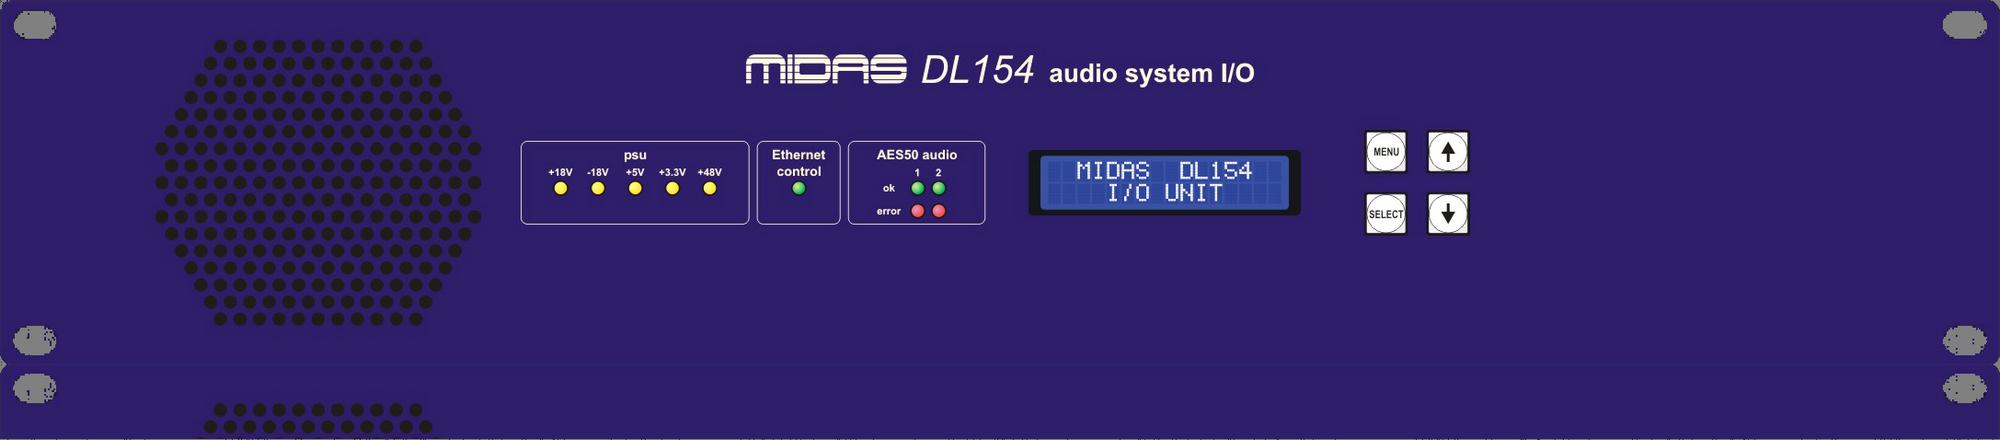 Midas DL154